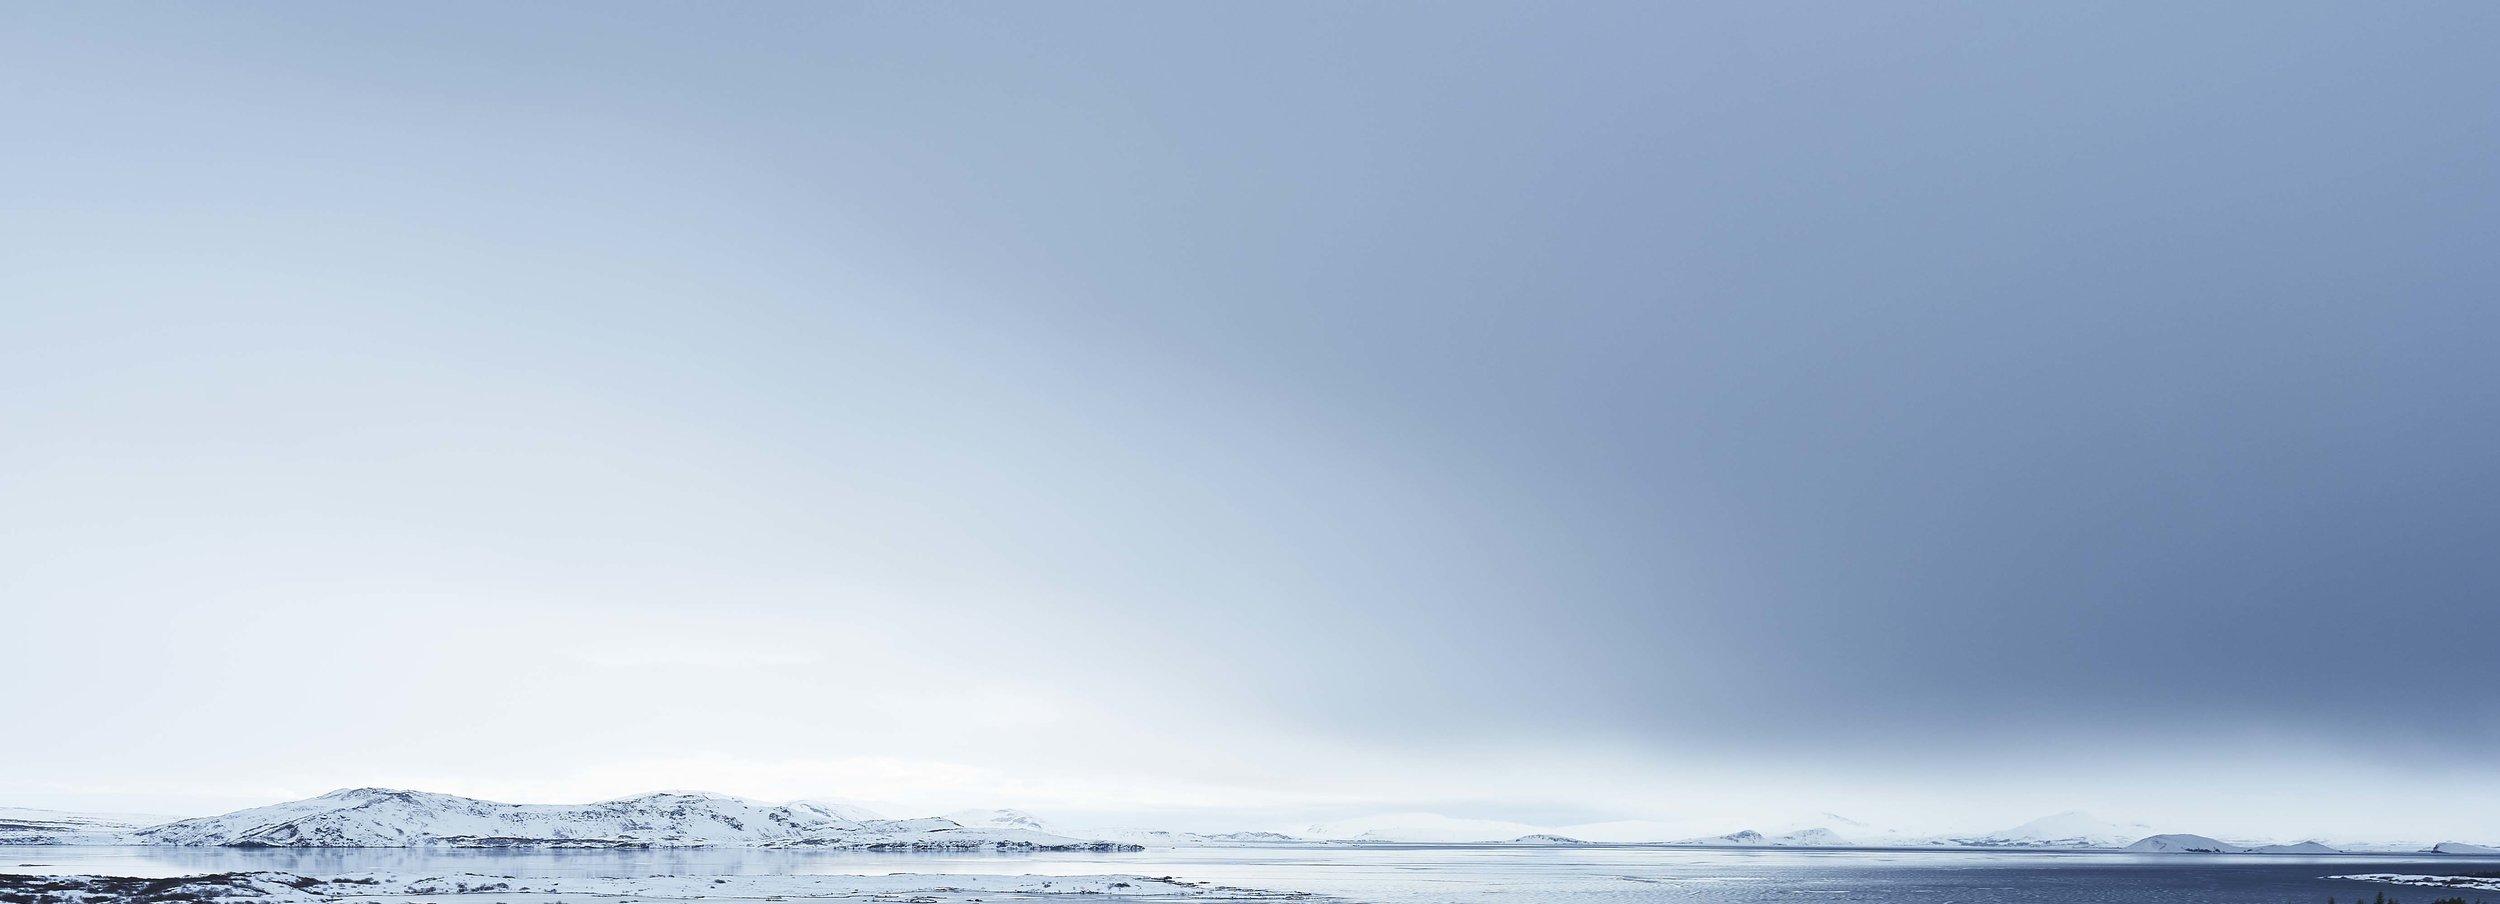 170307 Iceland 0832.jpg